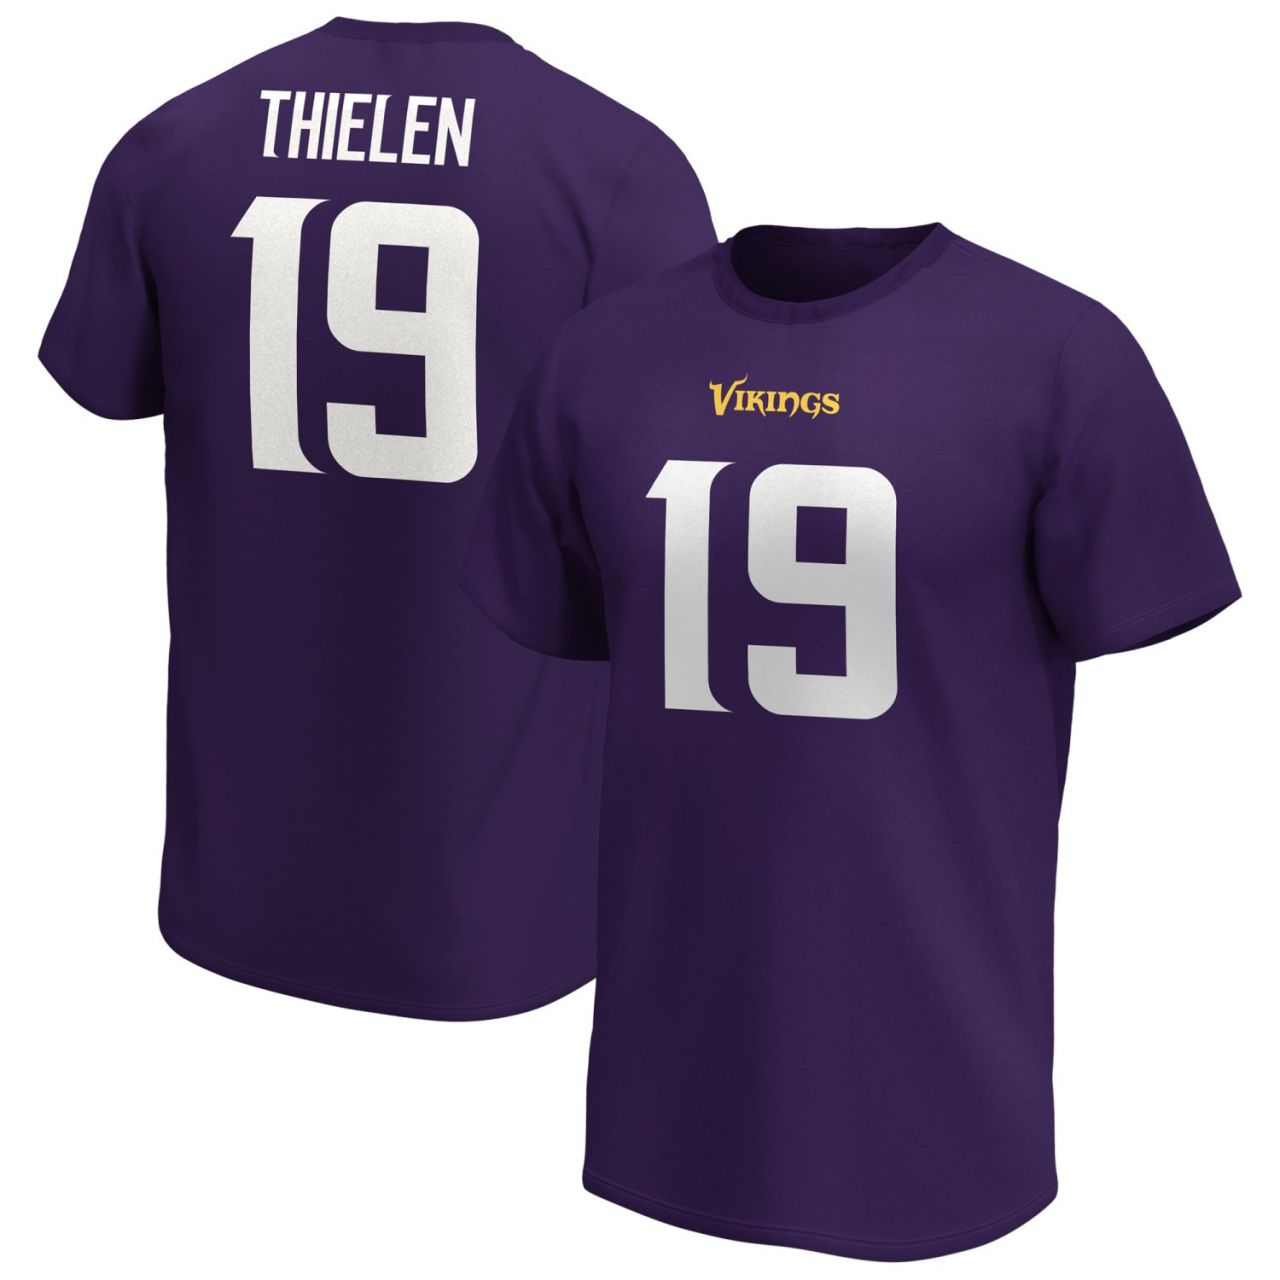 amfoo - Minnesota Vikings NFL Shirt #1 Adam Thielen